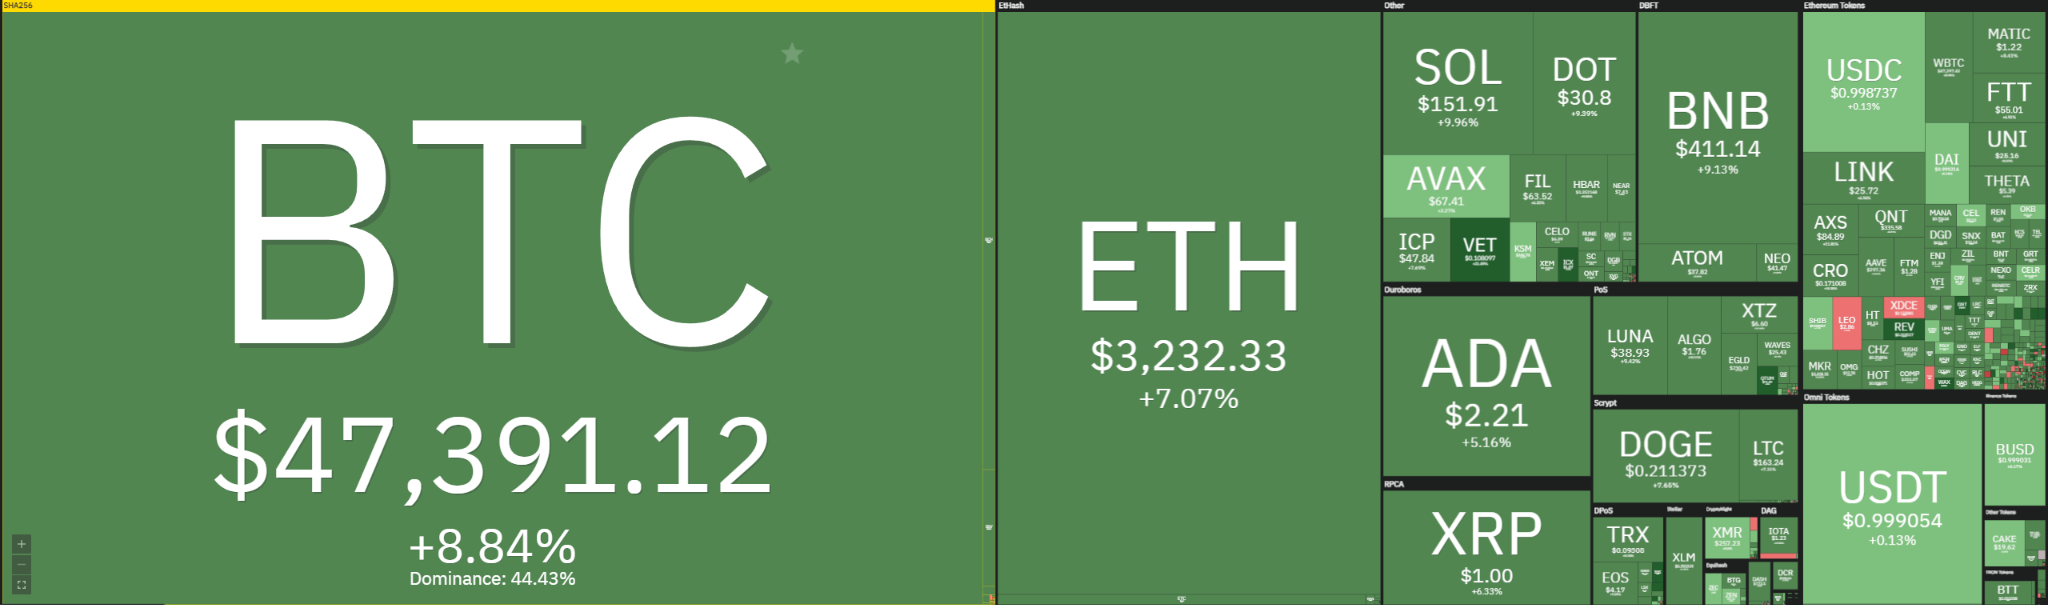 Bitcoin Price Analysis: BTC spikes to $48,000, slow reversal to follow? 1